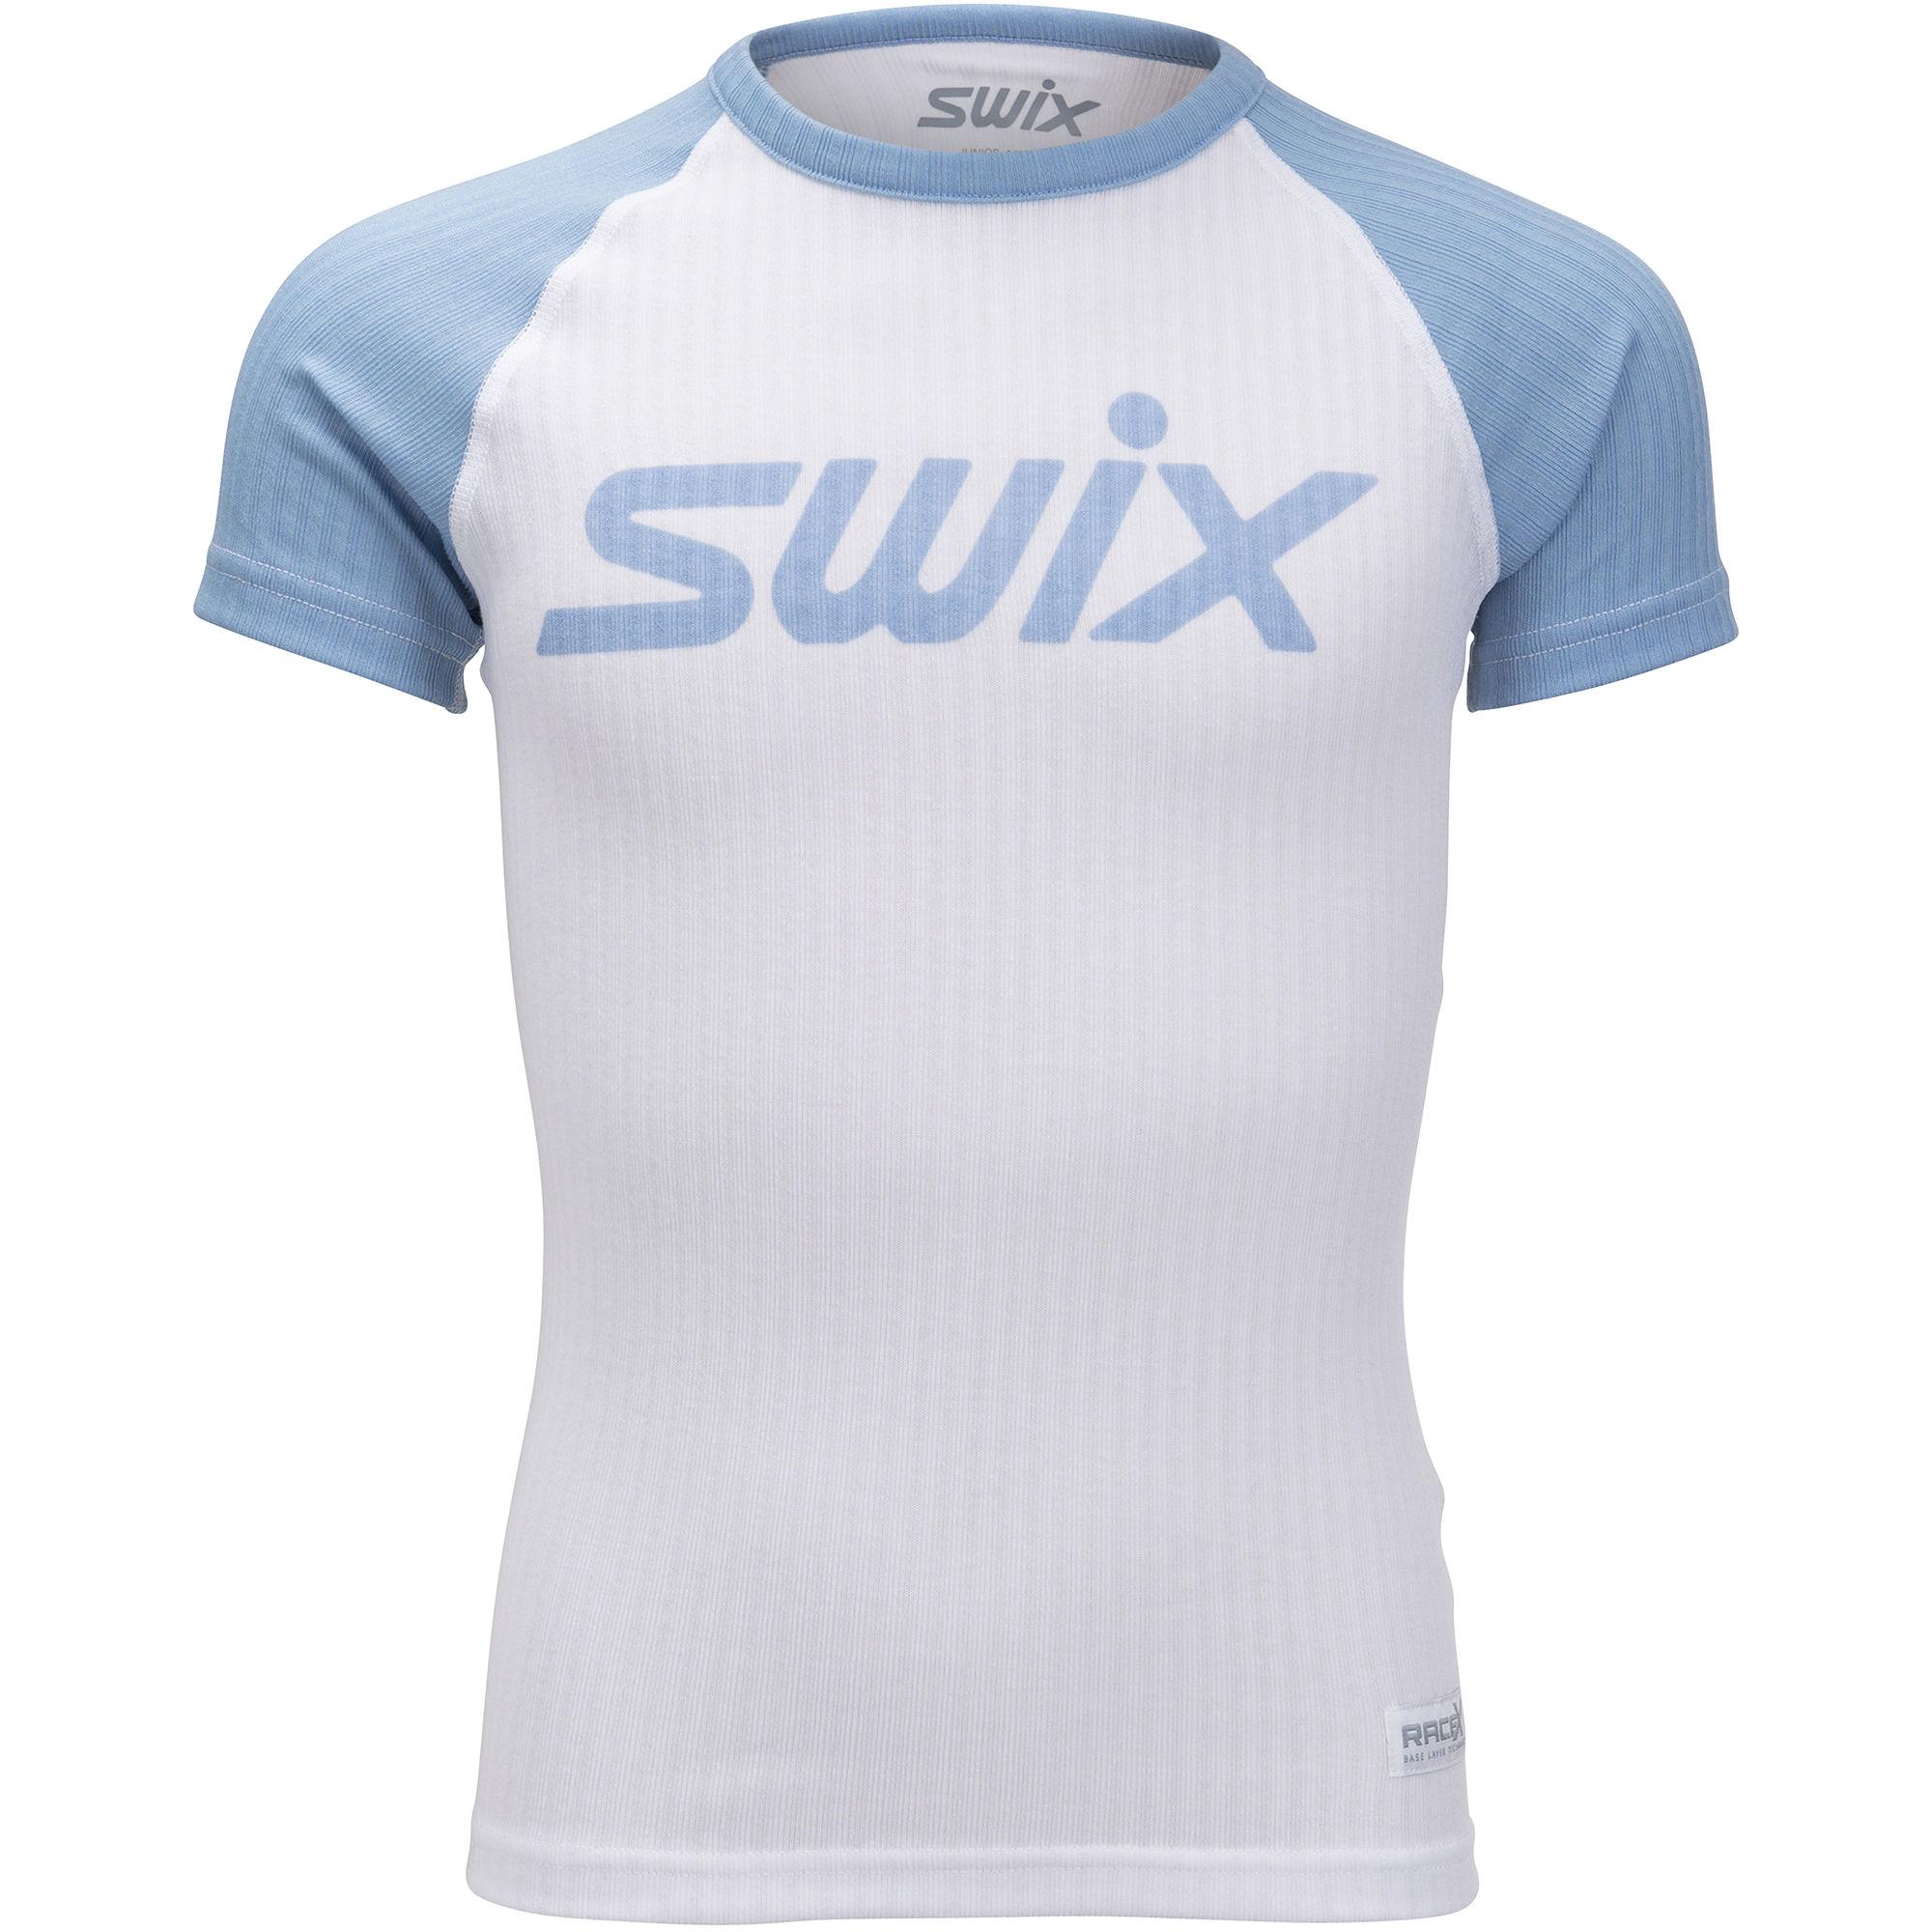 374a2ccde Welcome to Swix! | Swix